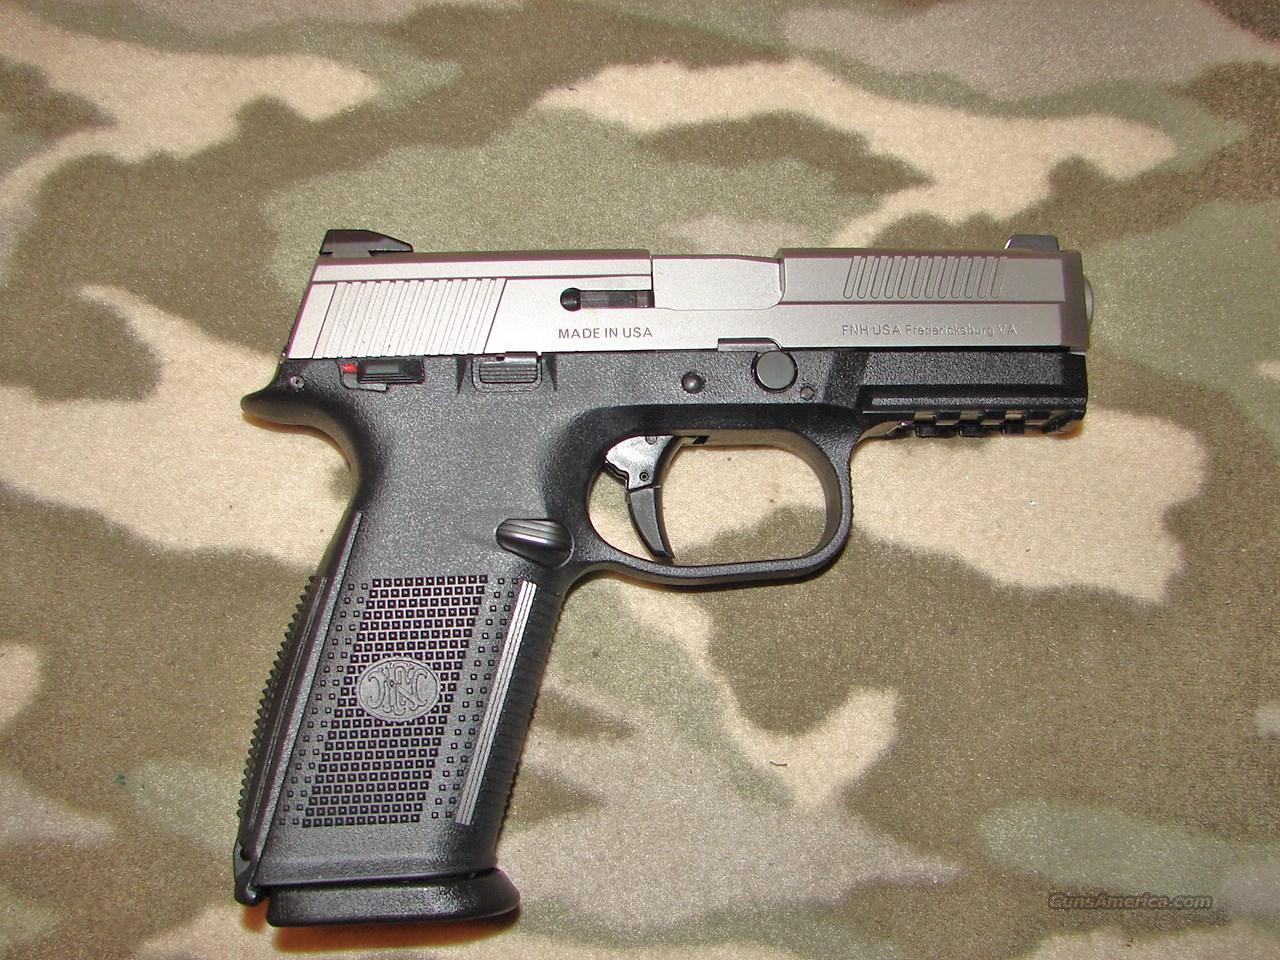 FN FNS40   Guns > Pistols > FNH - Fabrique Nationale (FN) Pistols > FNP